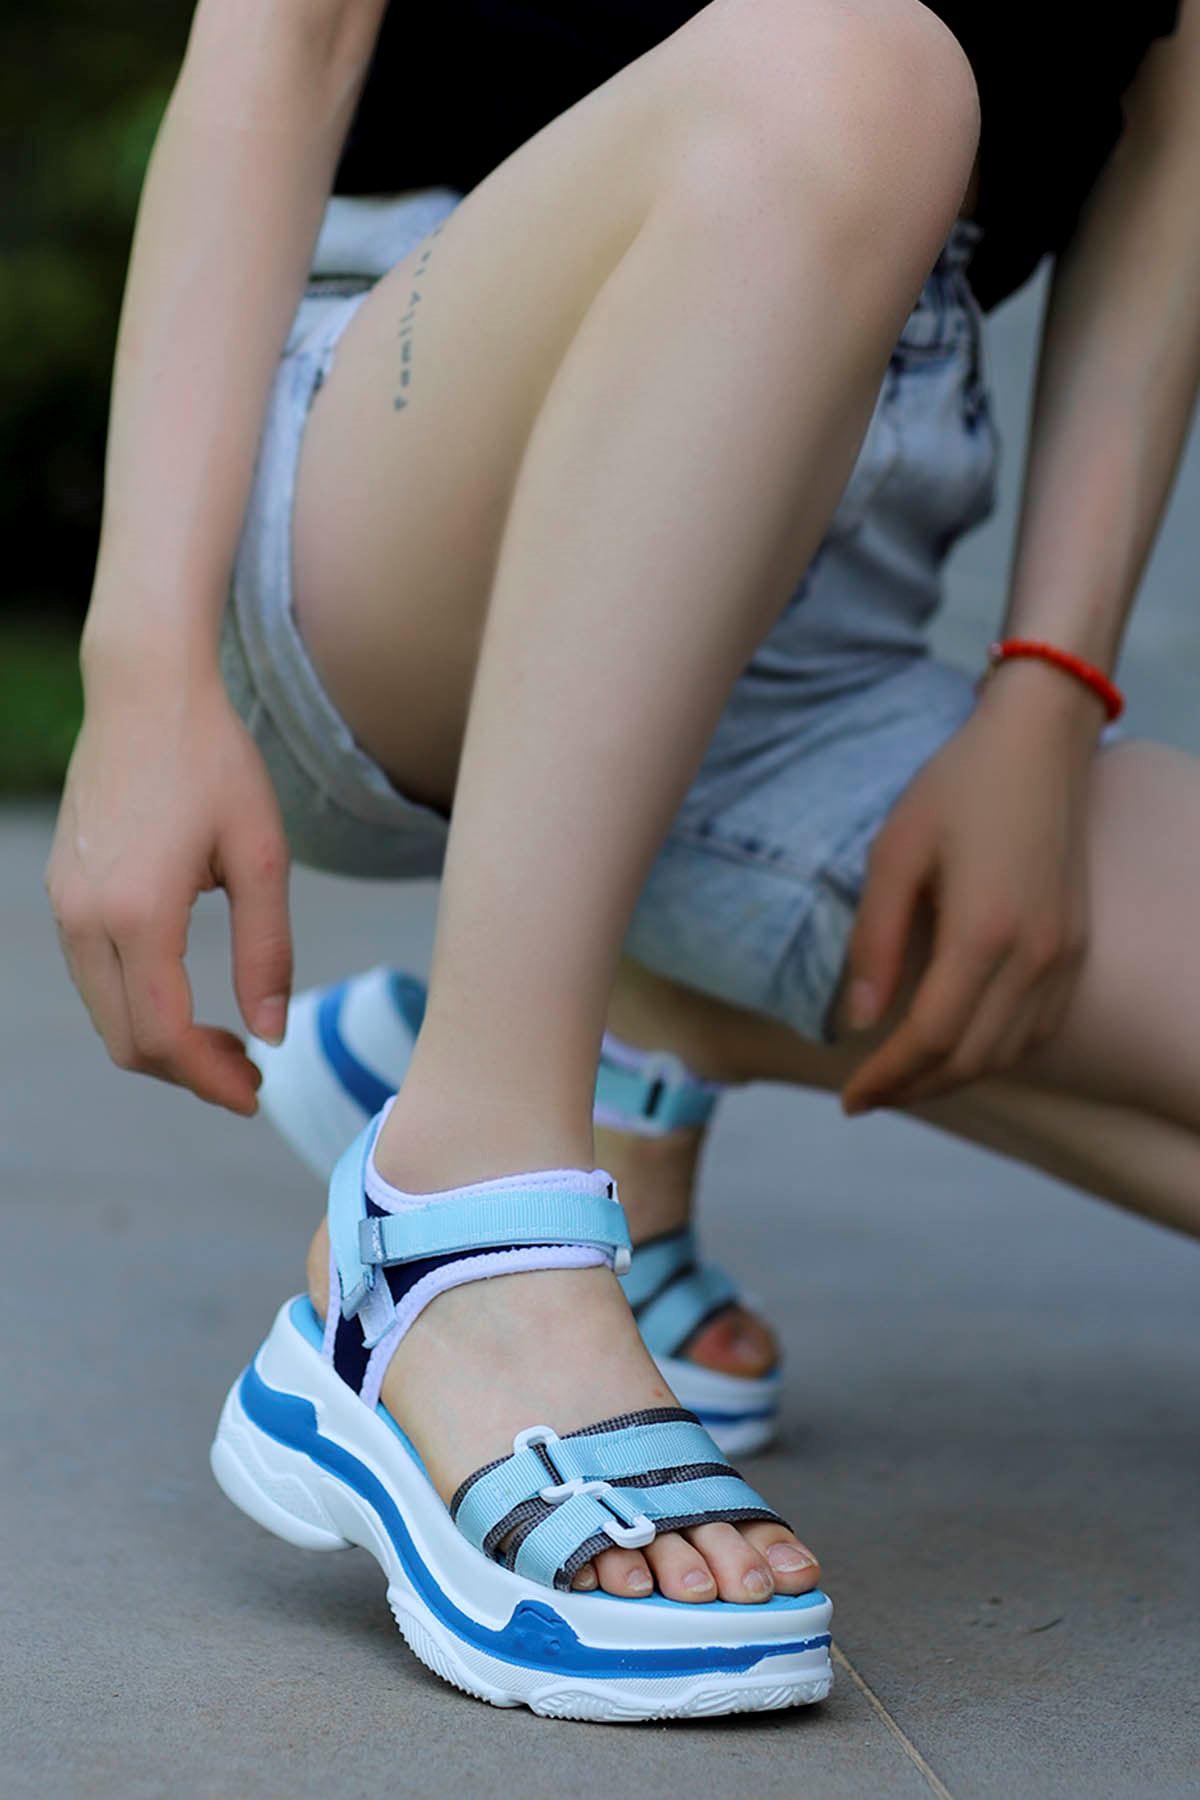 Hooly Dolgu Taban Sandalet Mavi